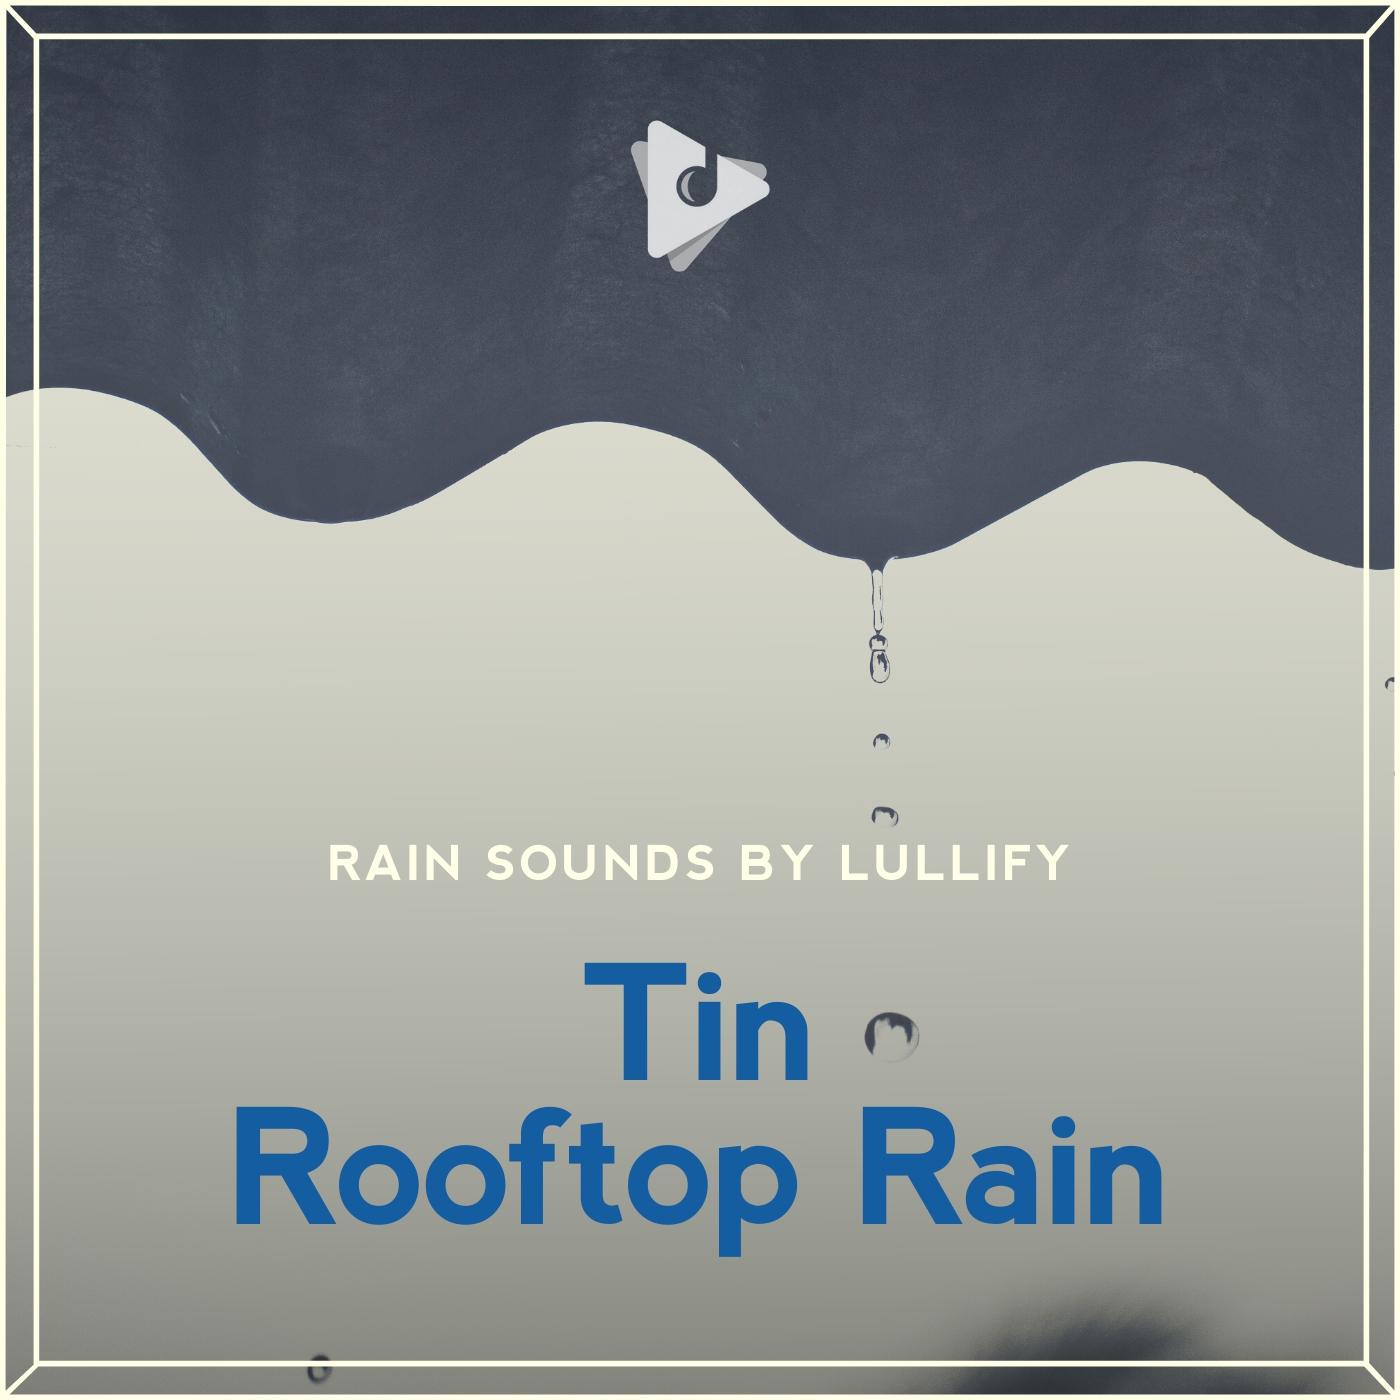 Tin Rooftop Rain